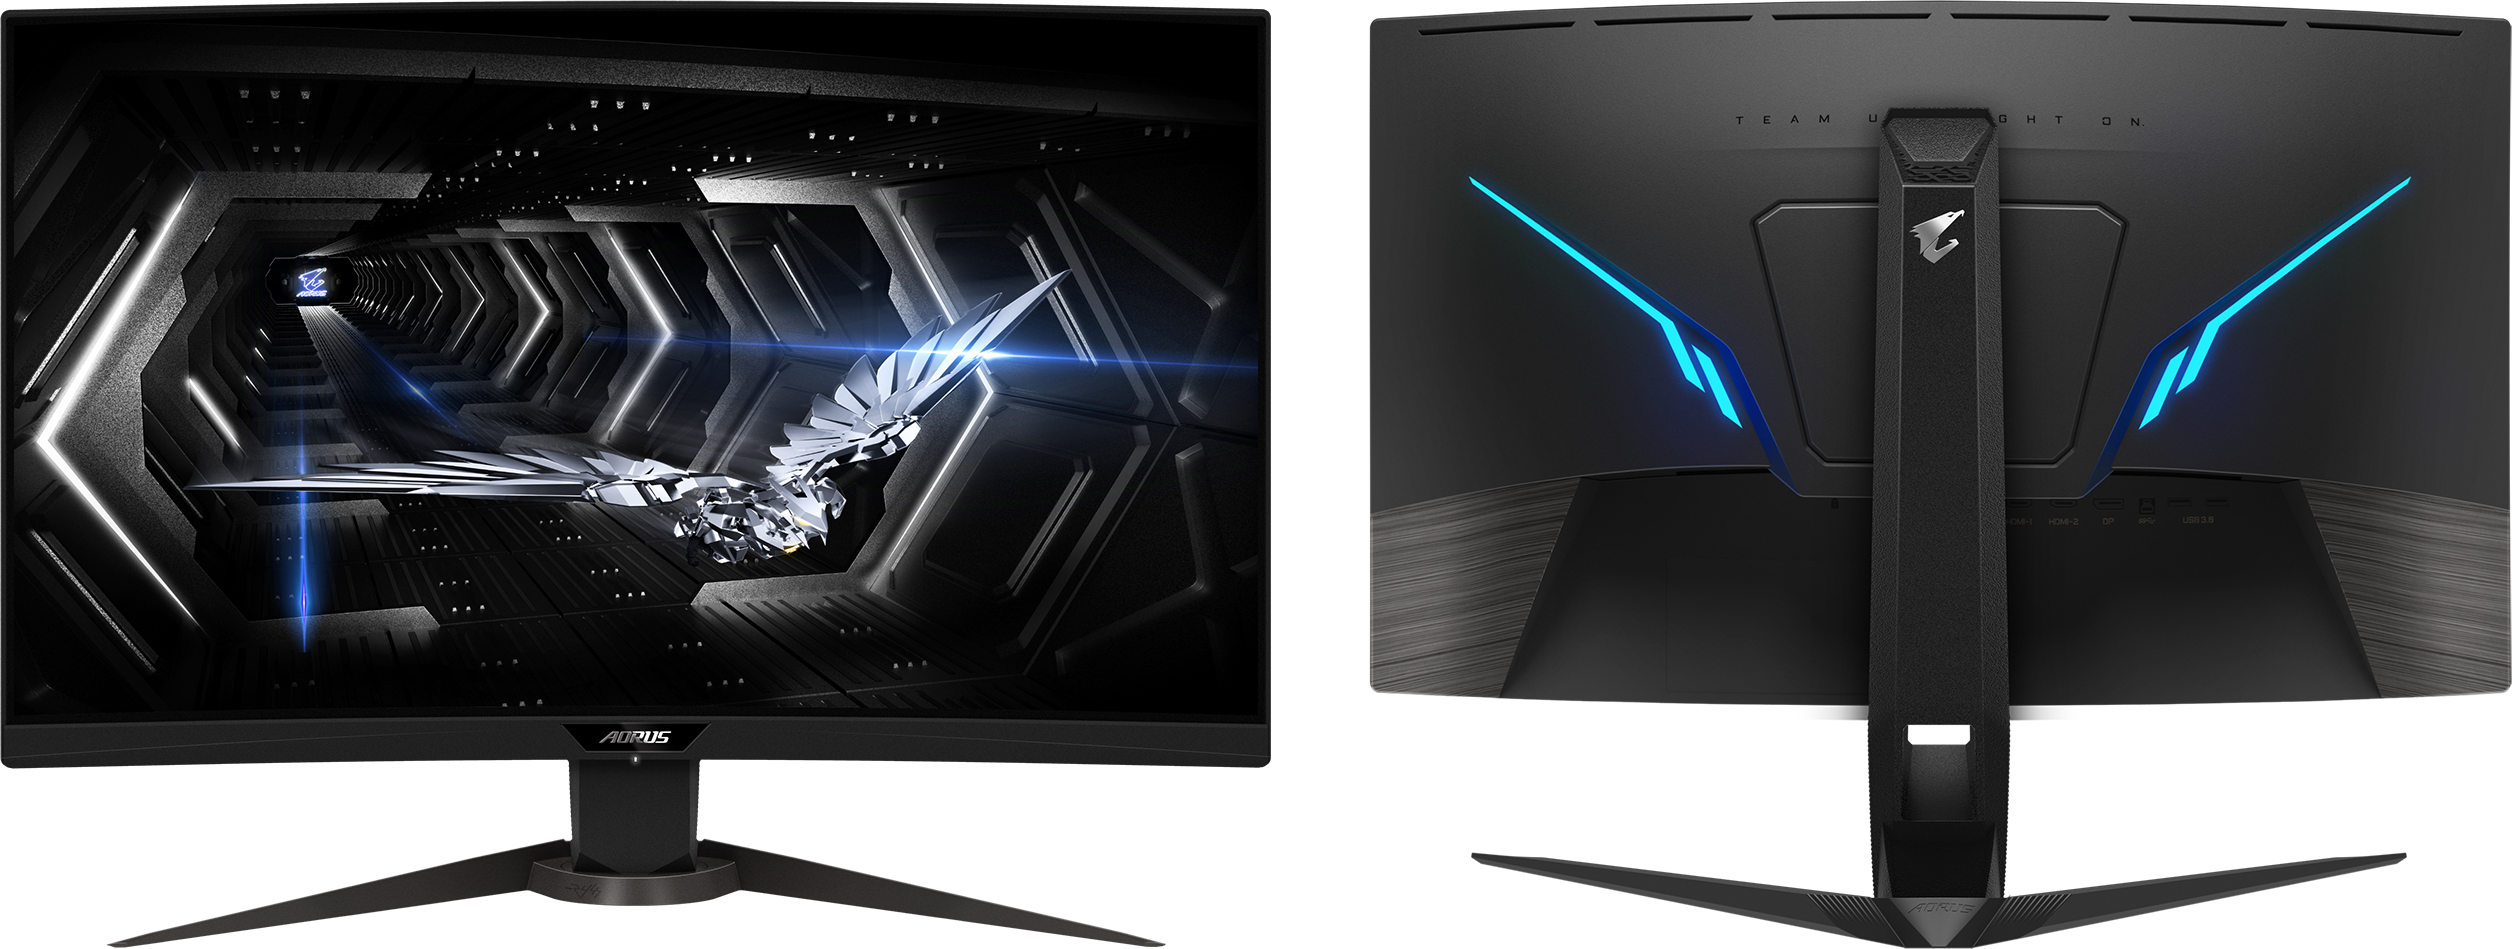 Black 165 Hz FreeSync//G-Sync Compatible Gaming Monitor 2560 x 1440 Gigabyte AORUS CV27Q 27 Inch Curved VA QHD